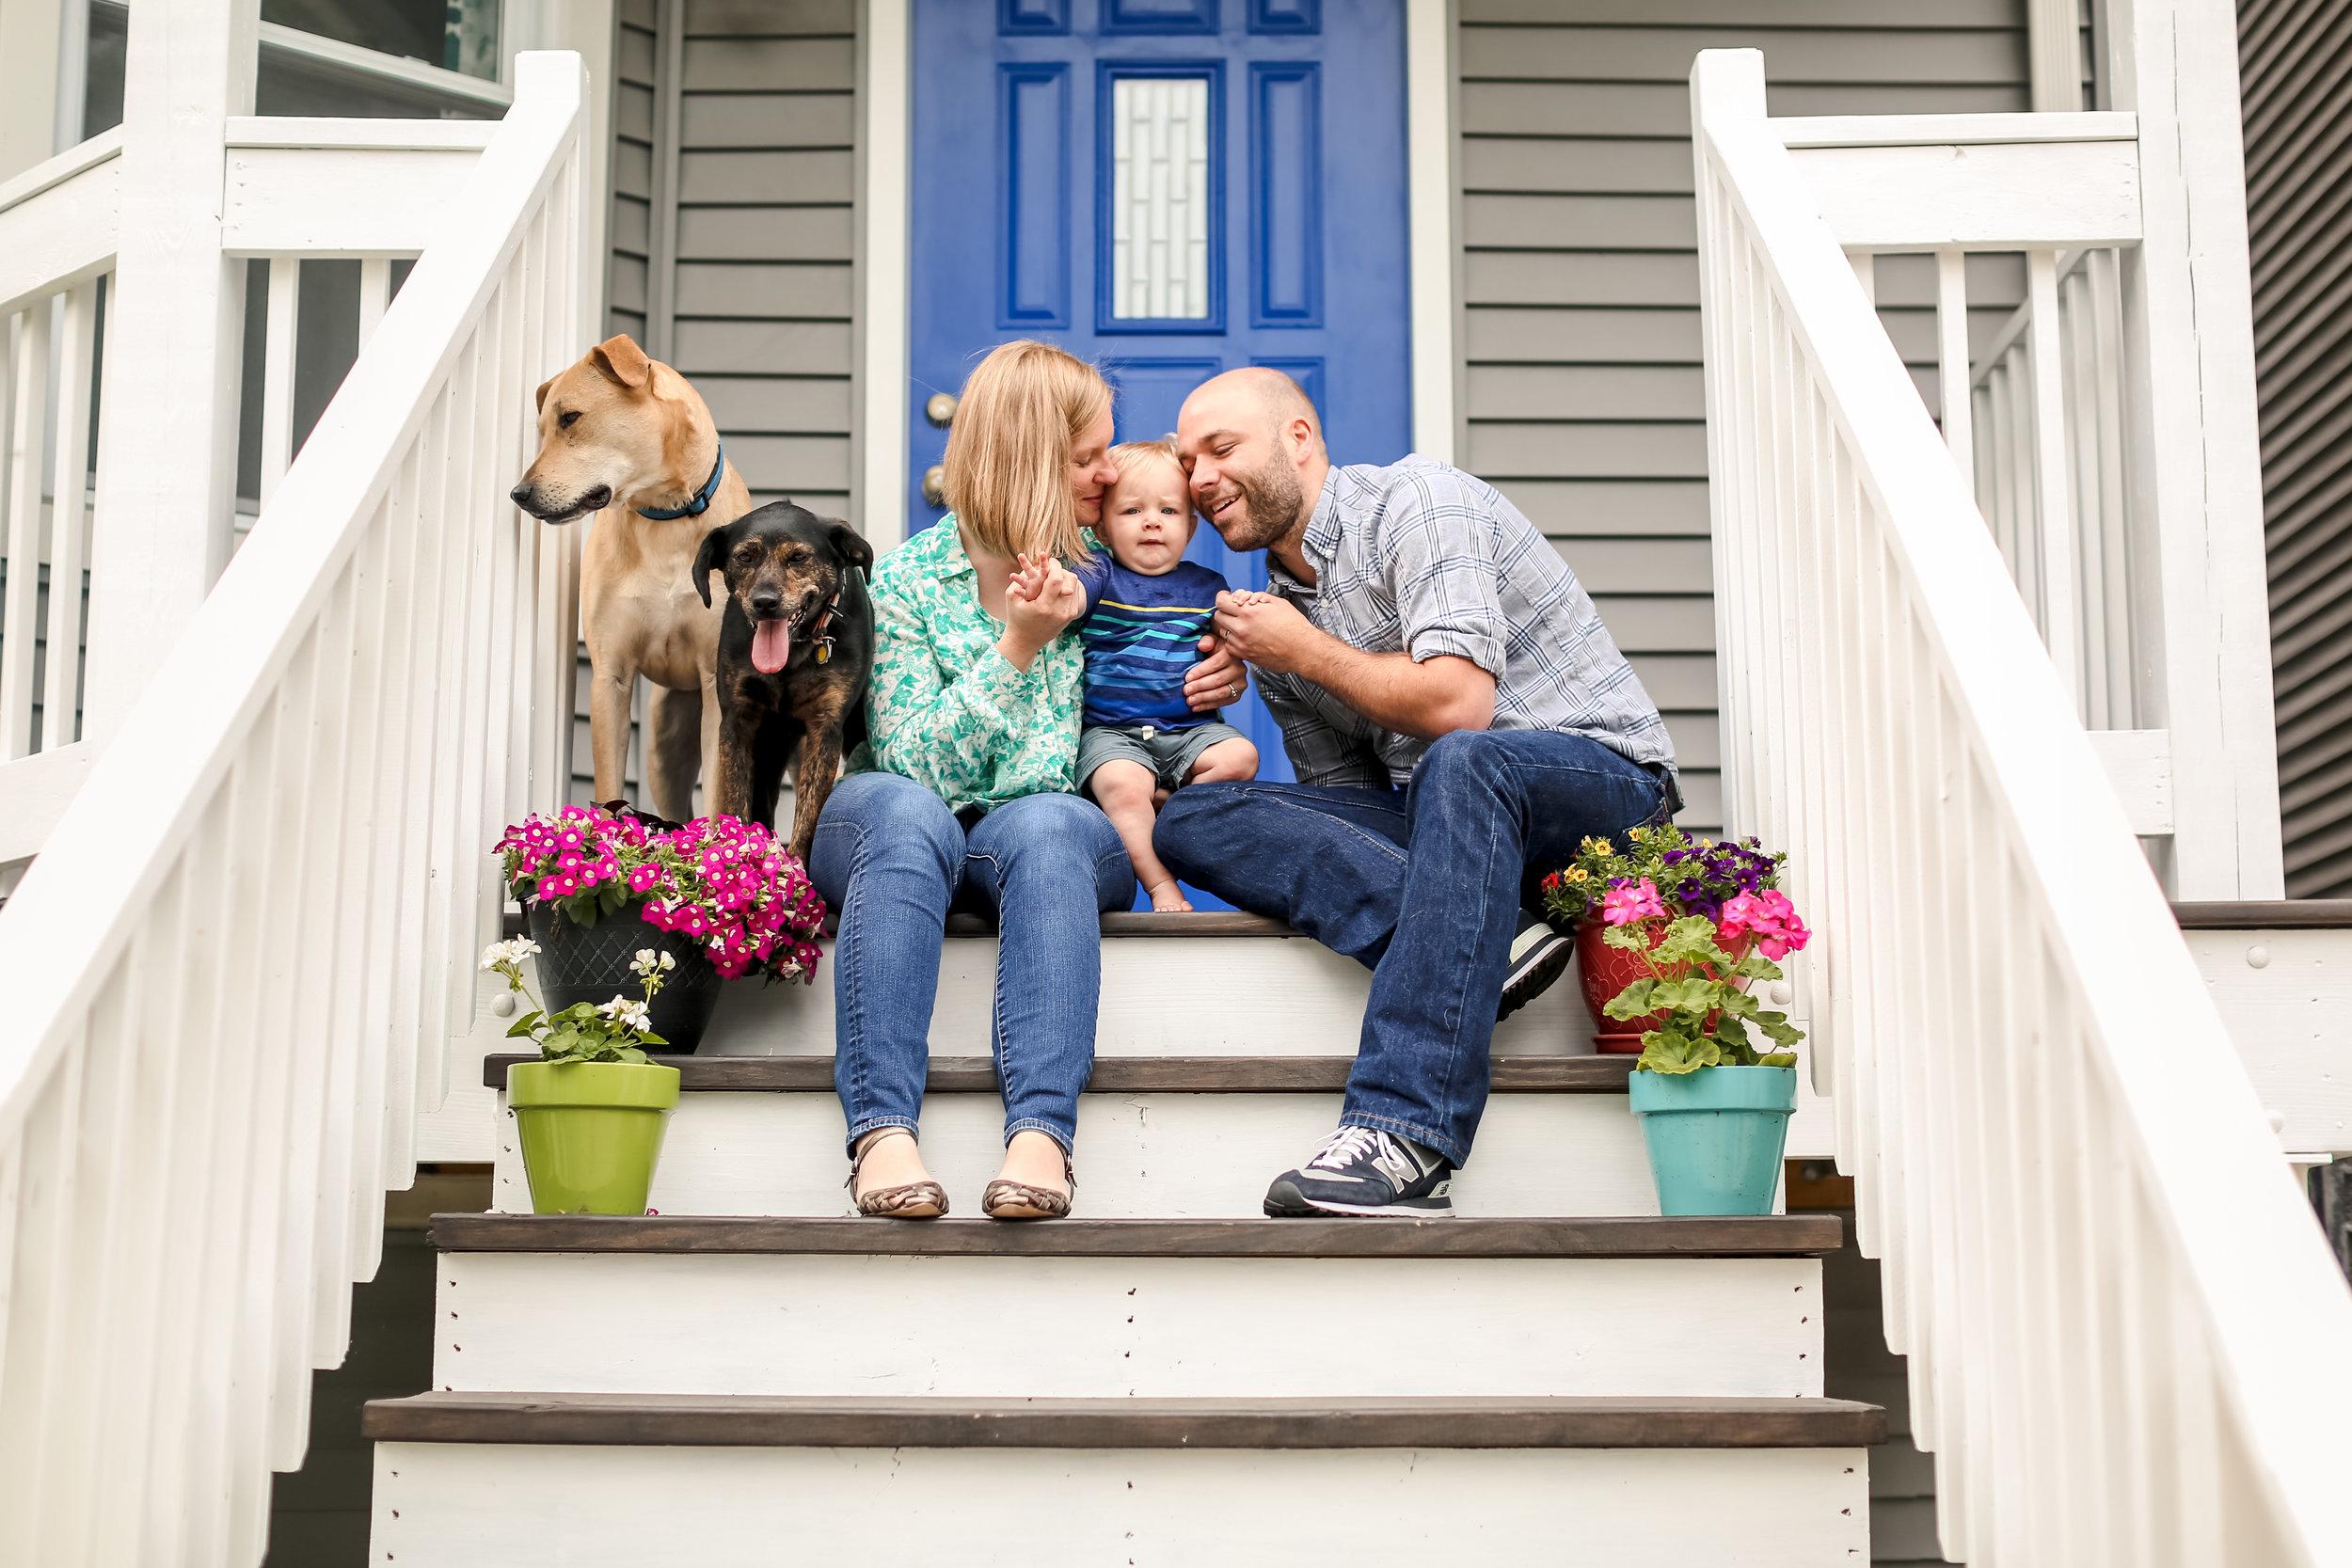 chicago family lifestyle photographer jenny grimm photography avondale